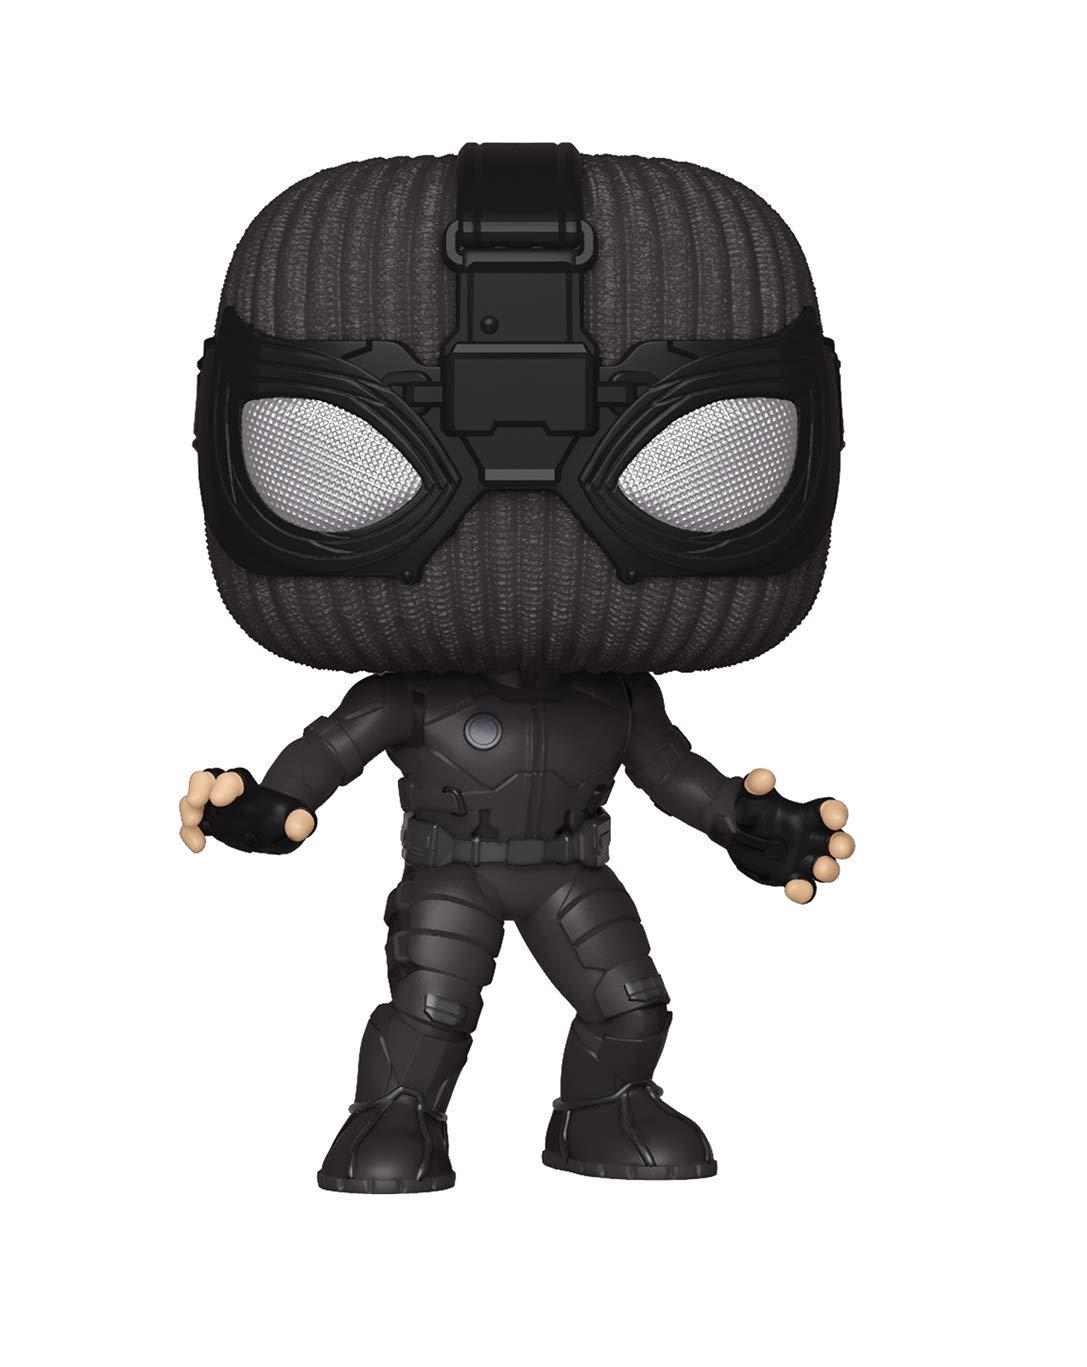 Funko Pop! Marvel: Spider-Man Far from Home - Night Monkey Figure - $6 @ Amazon / Walmart